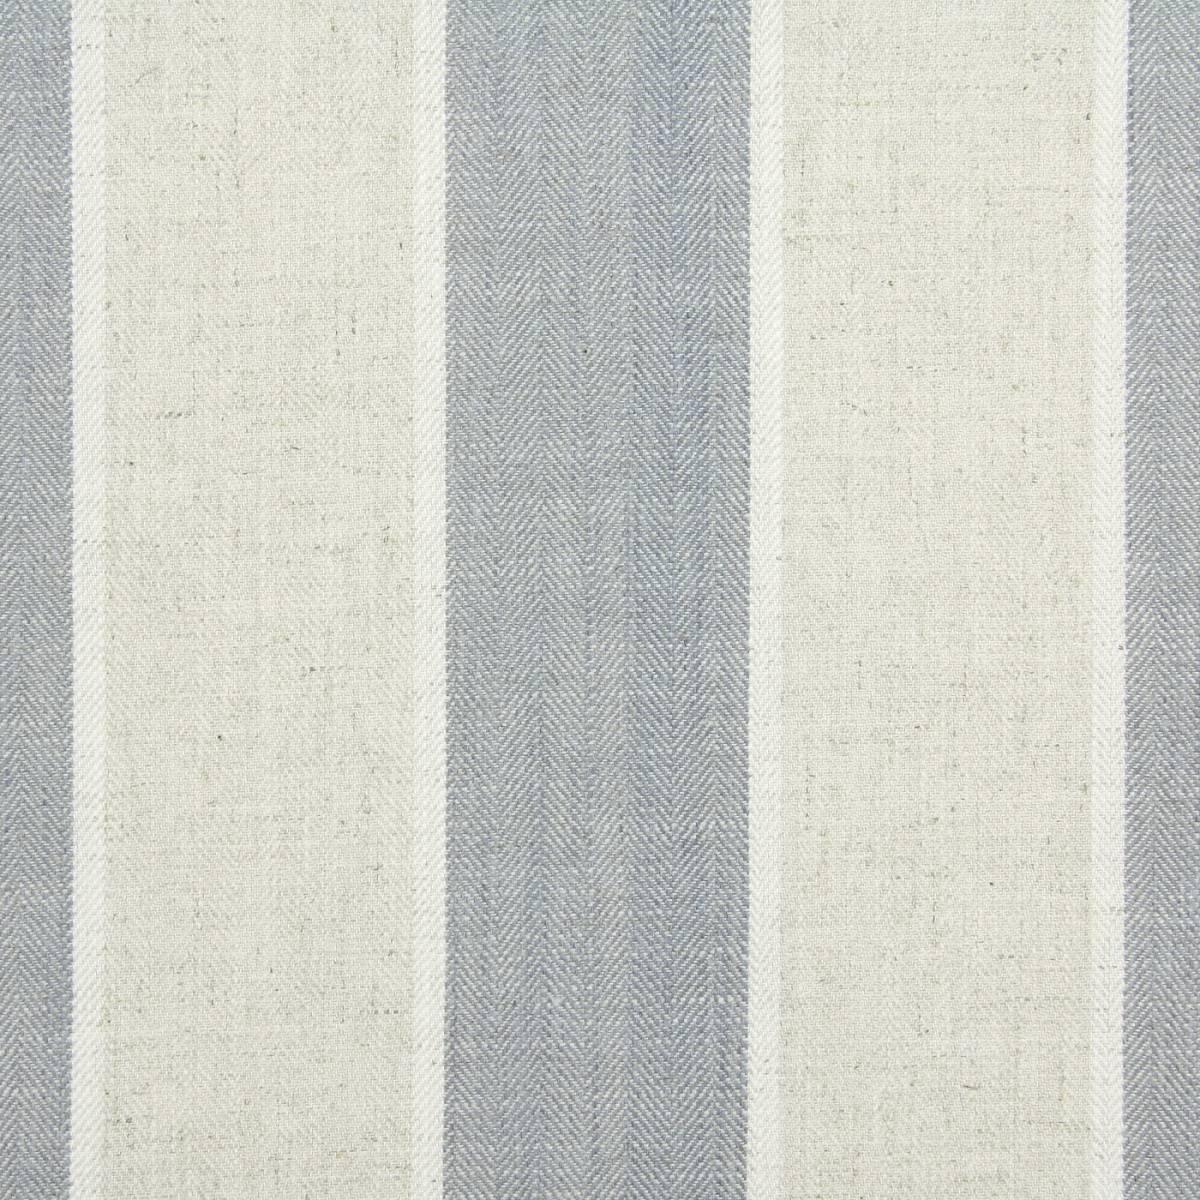 celeste fabric denim 1414 703 prestigious textiles andiamo fabrics collection. Black Bedroom Furniture Sets. Home Design Ideas